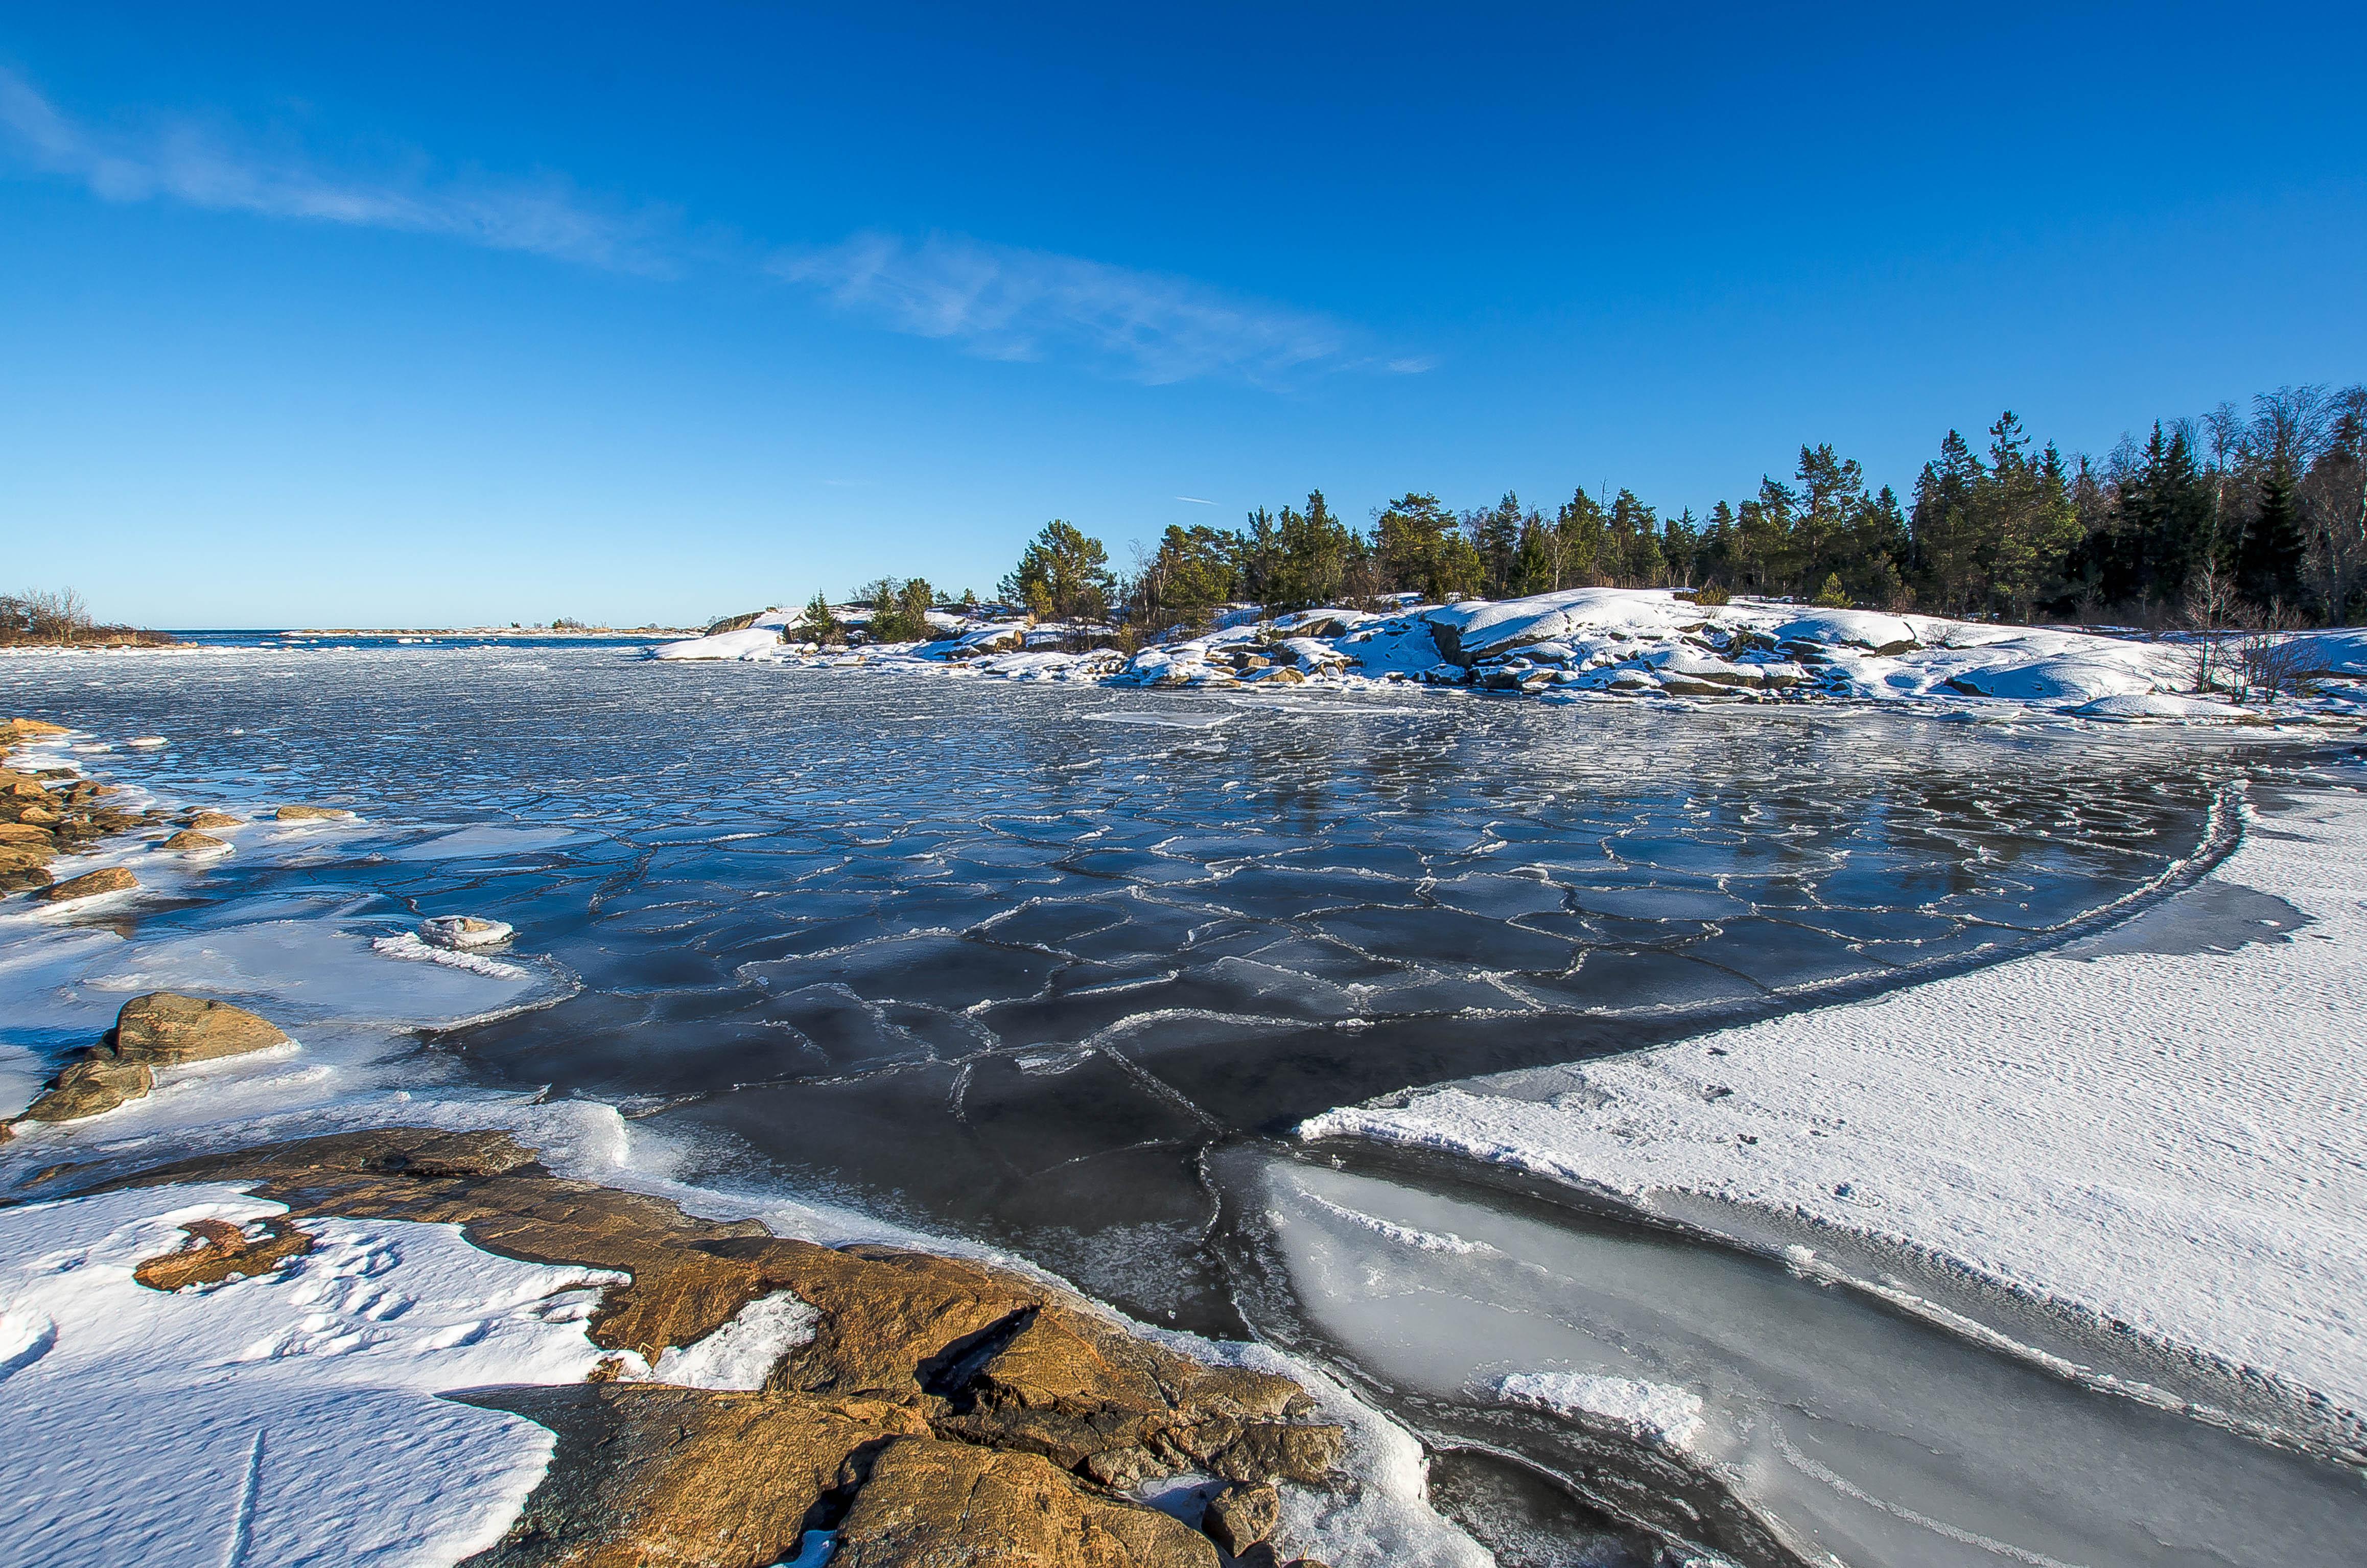 snow winter seasons sea - photo #44